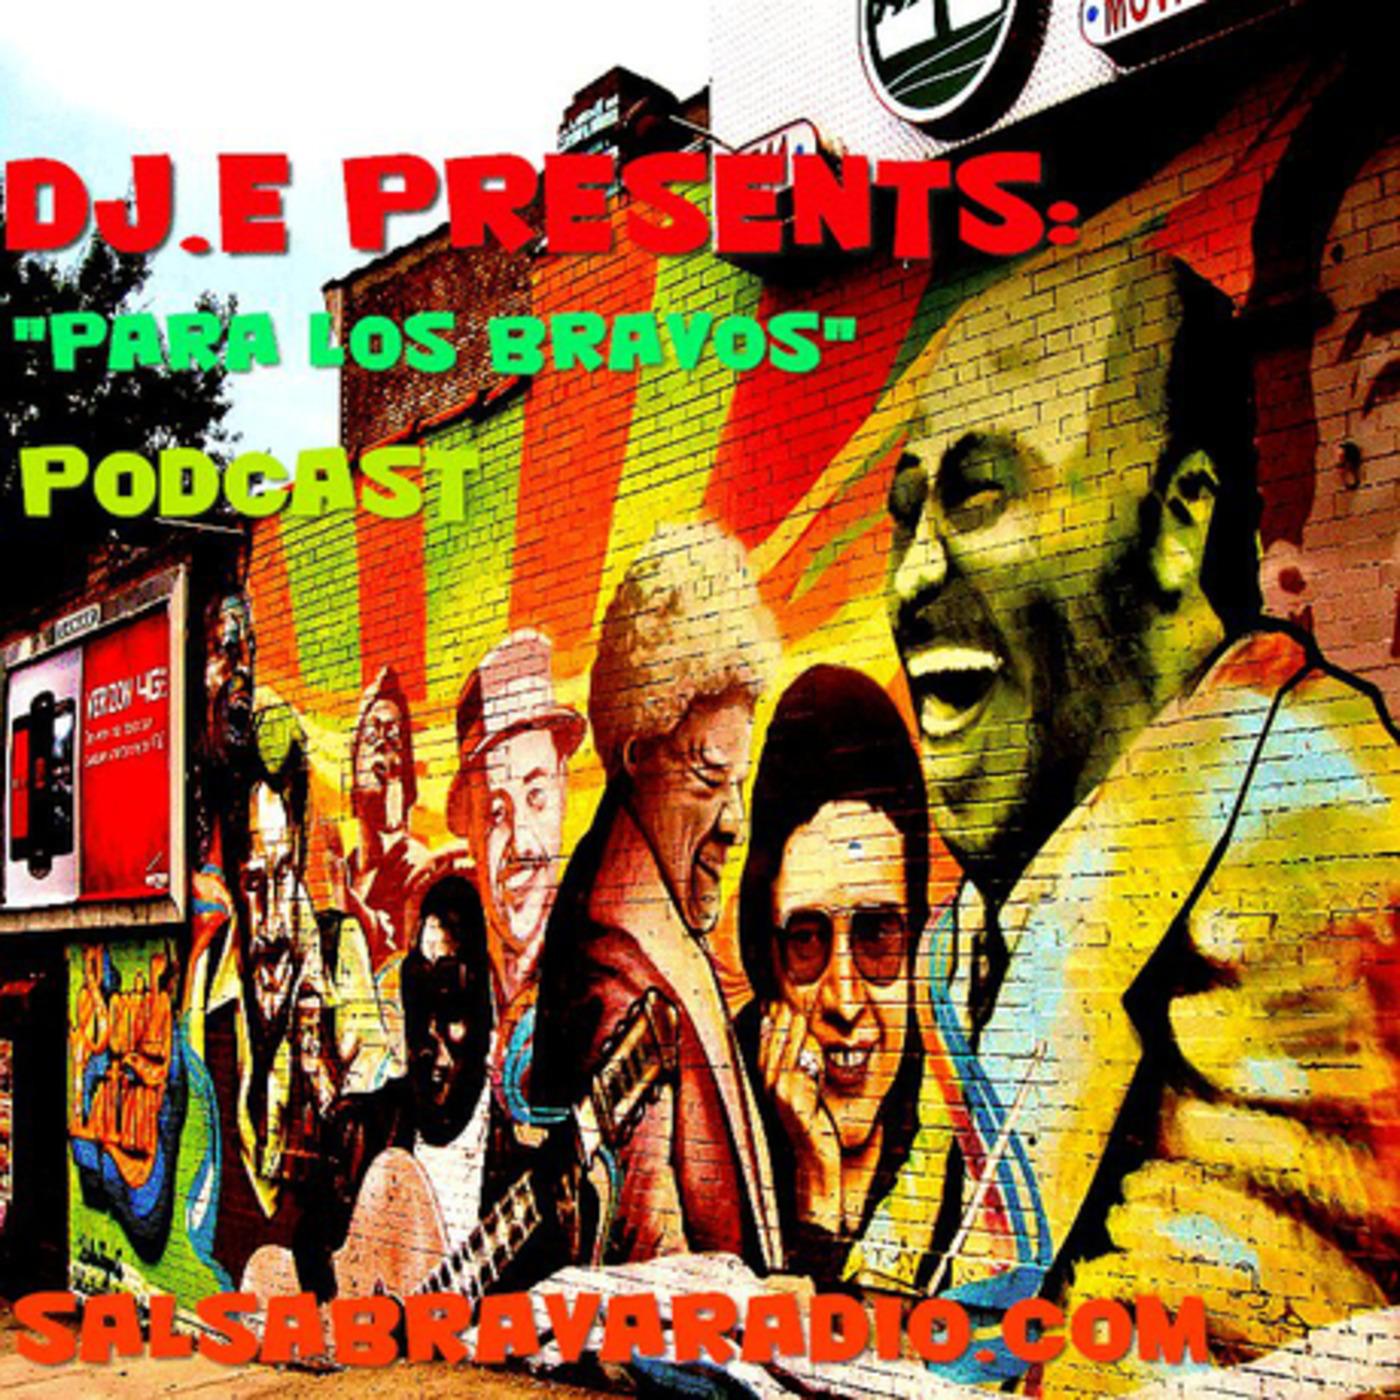 Para Los Bravos Podcast  Salsa Brava Radio